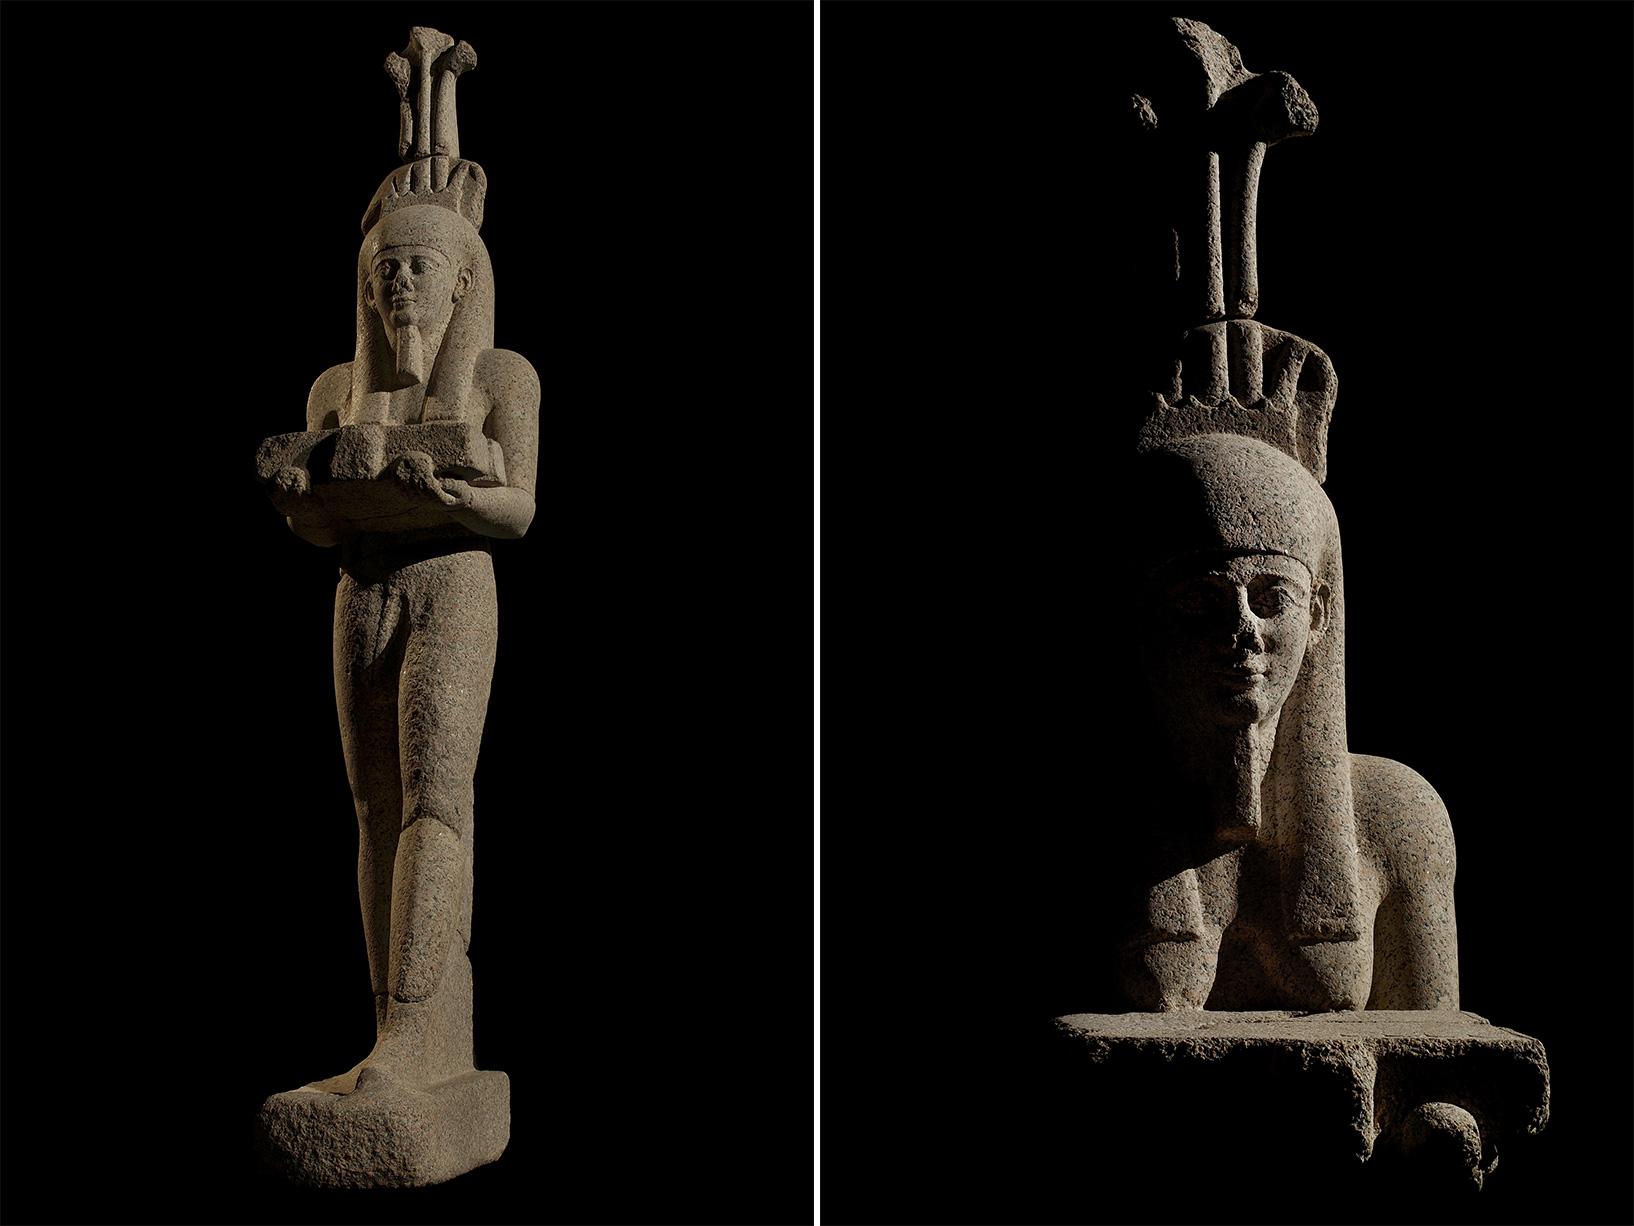 Sunken Cities Colossal Statues